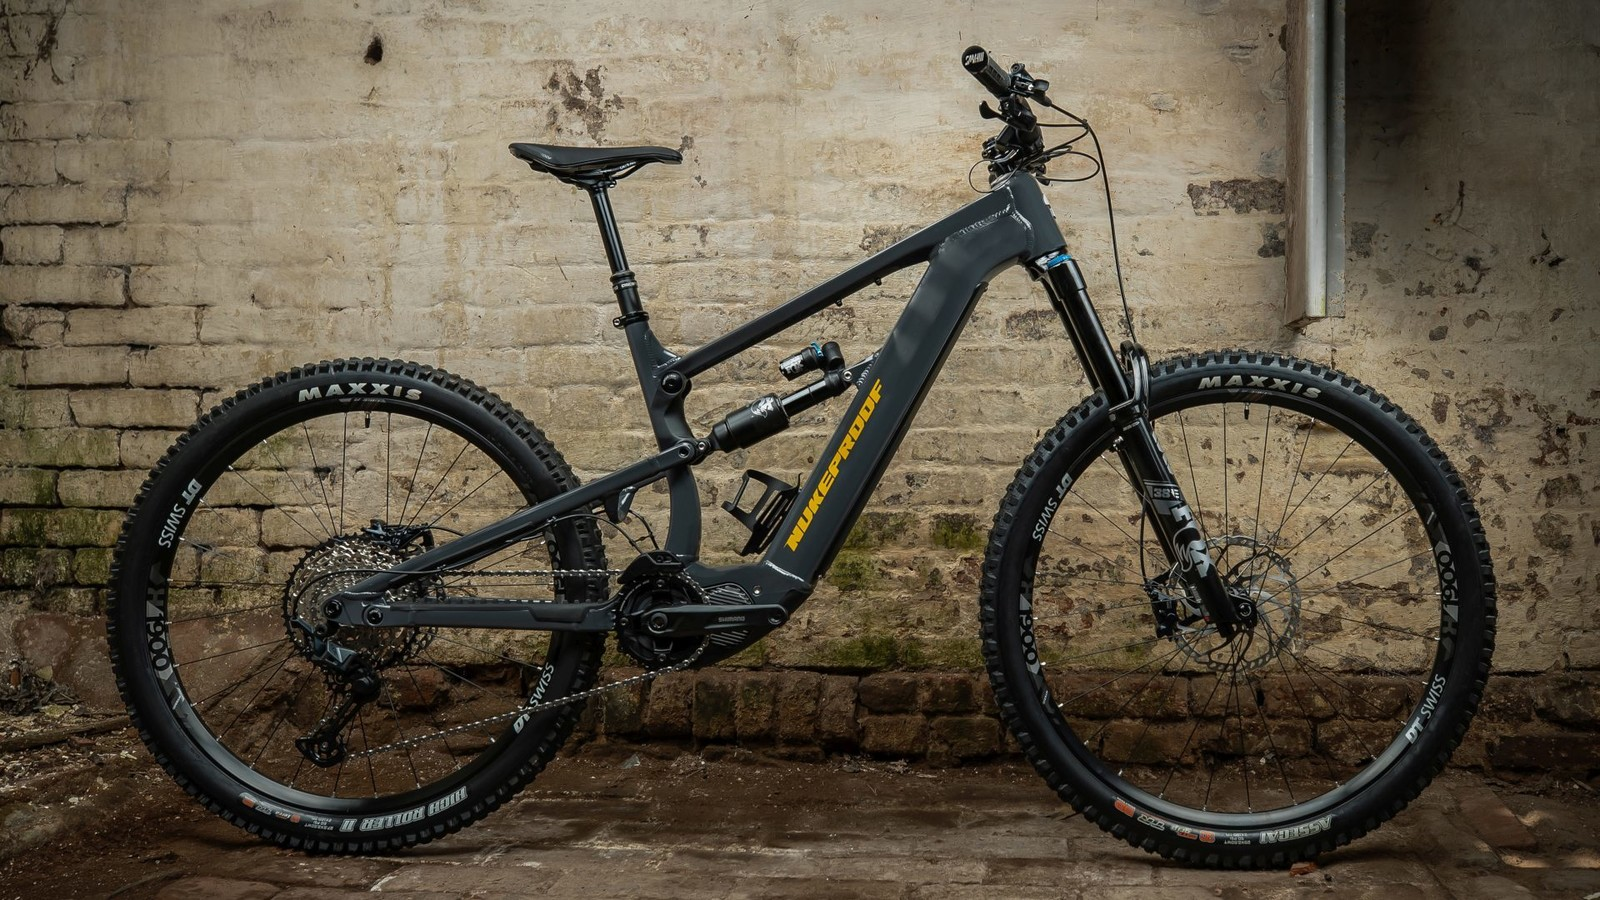 Introducing the Nukeproof MegaWatt 297 Alloy E-Bike